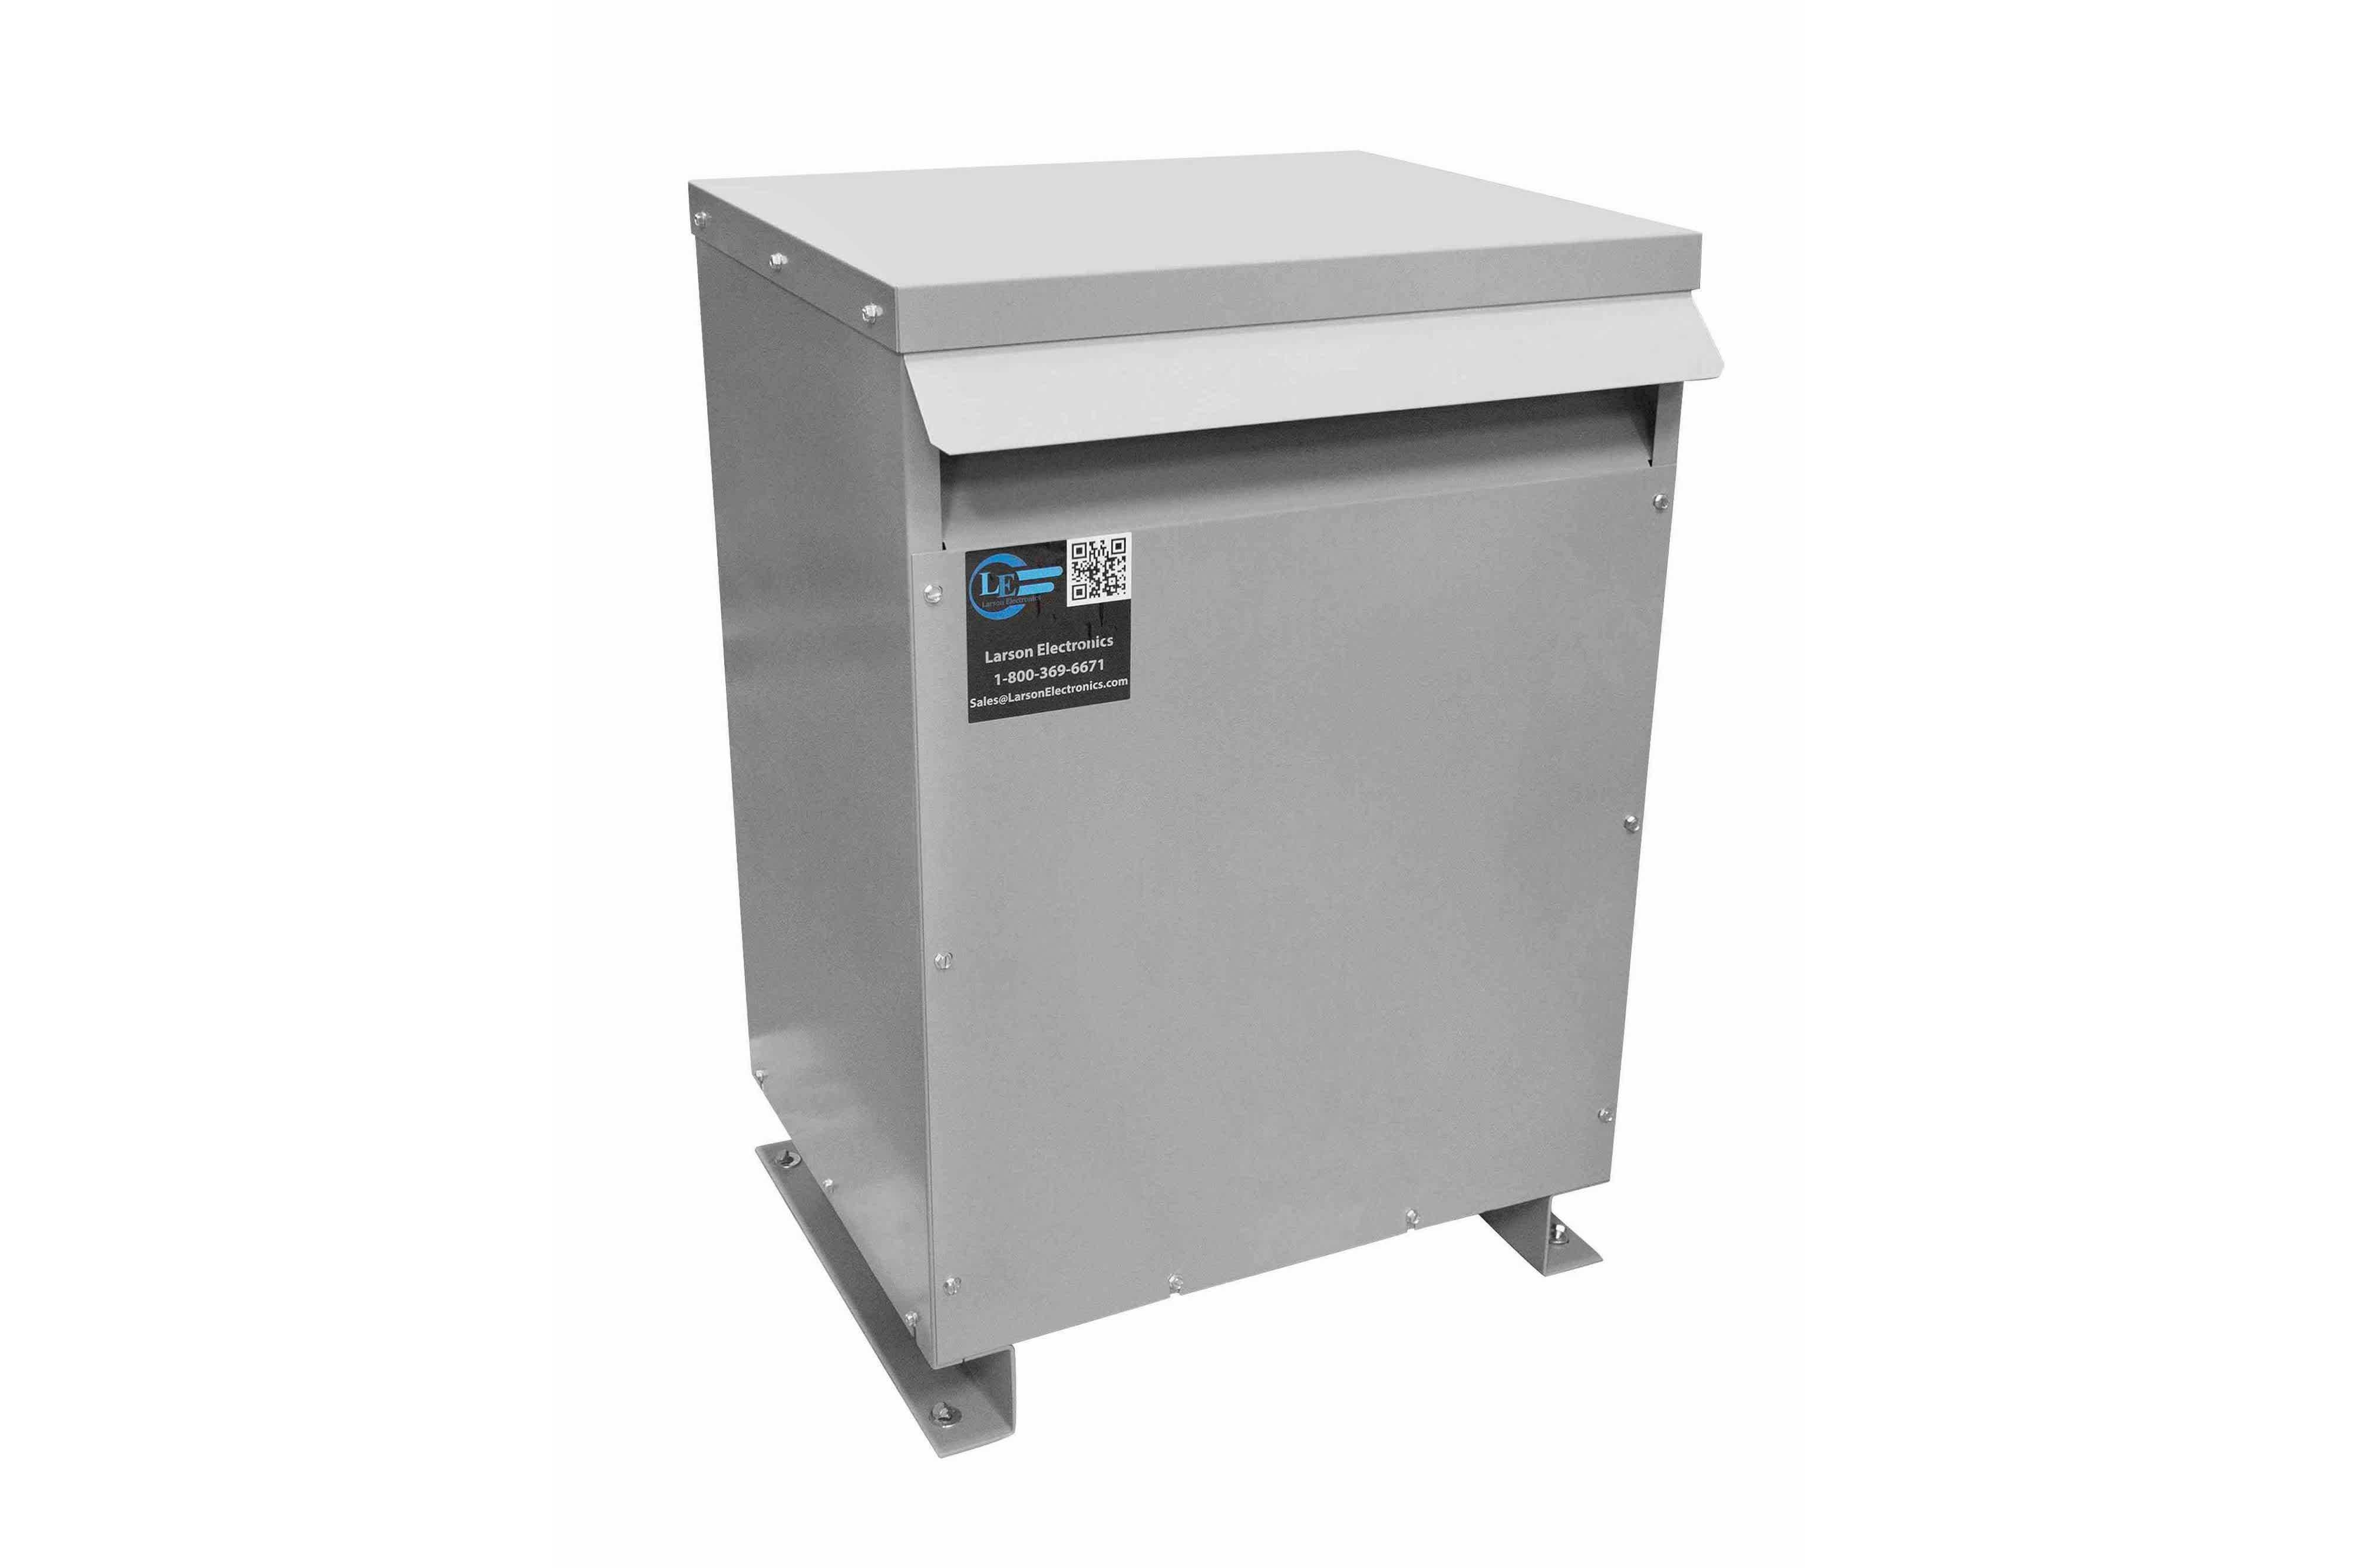 225 kVA 3PH Isolation Transformer, 230V Wye Primary, 208V Delta Secondary, N3R, Ventilated, 60 Hz